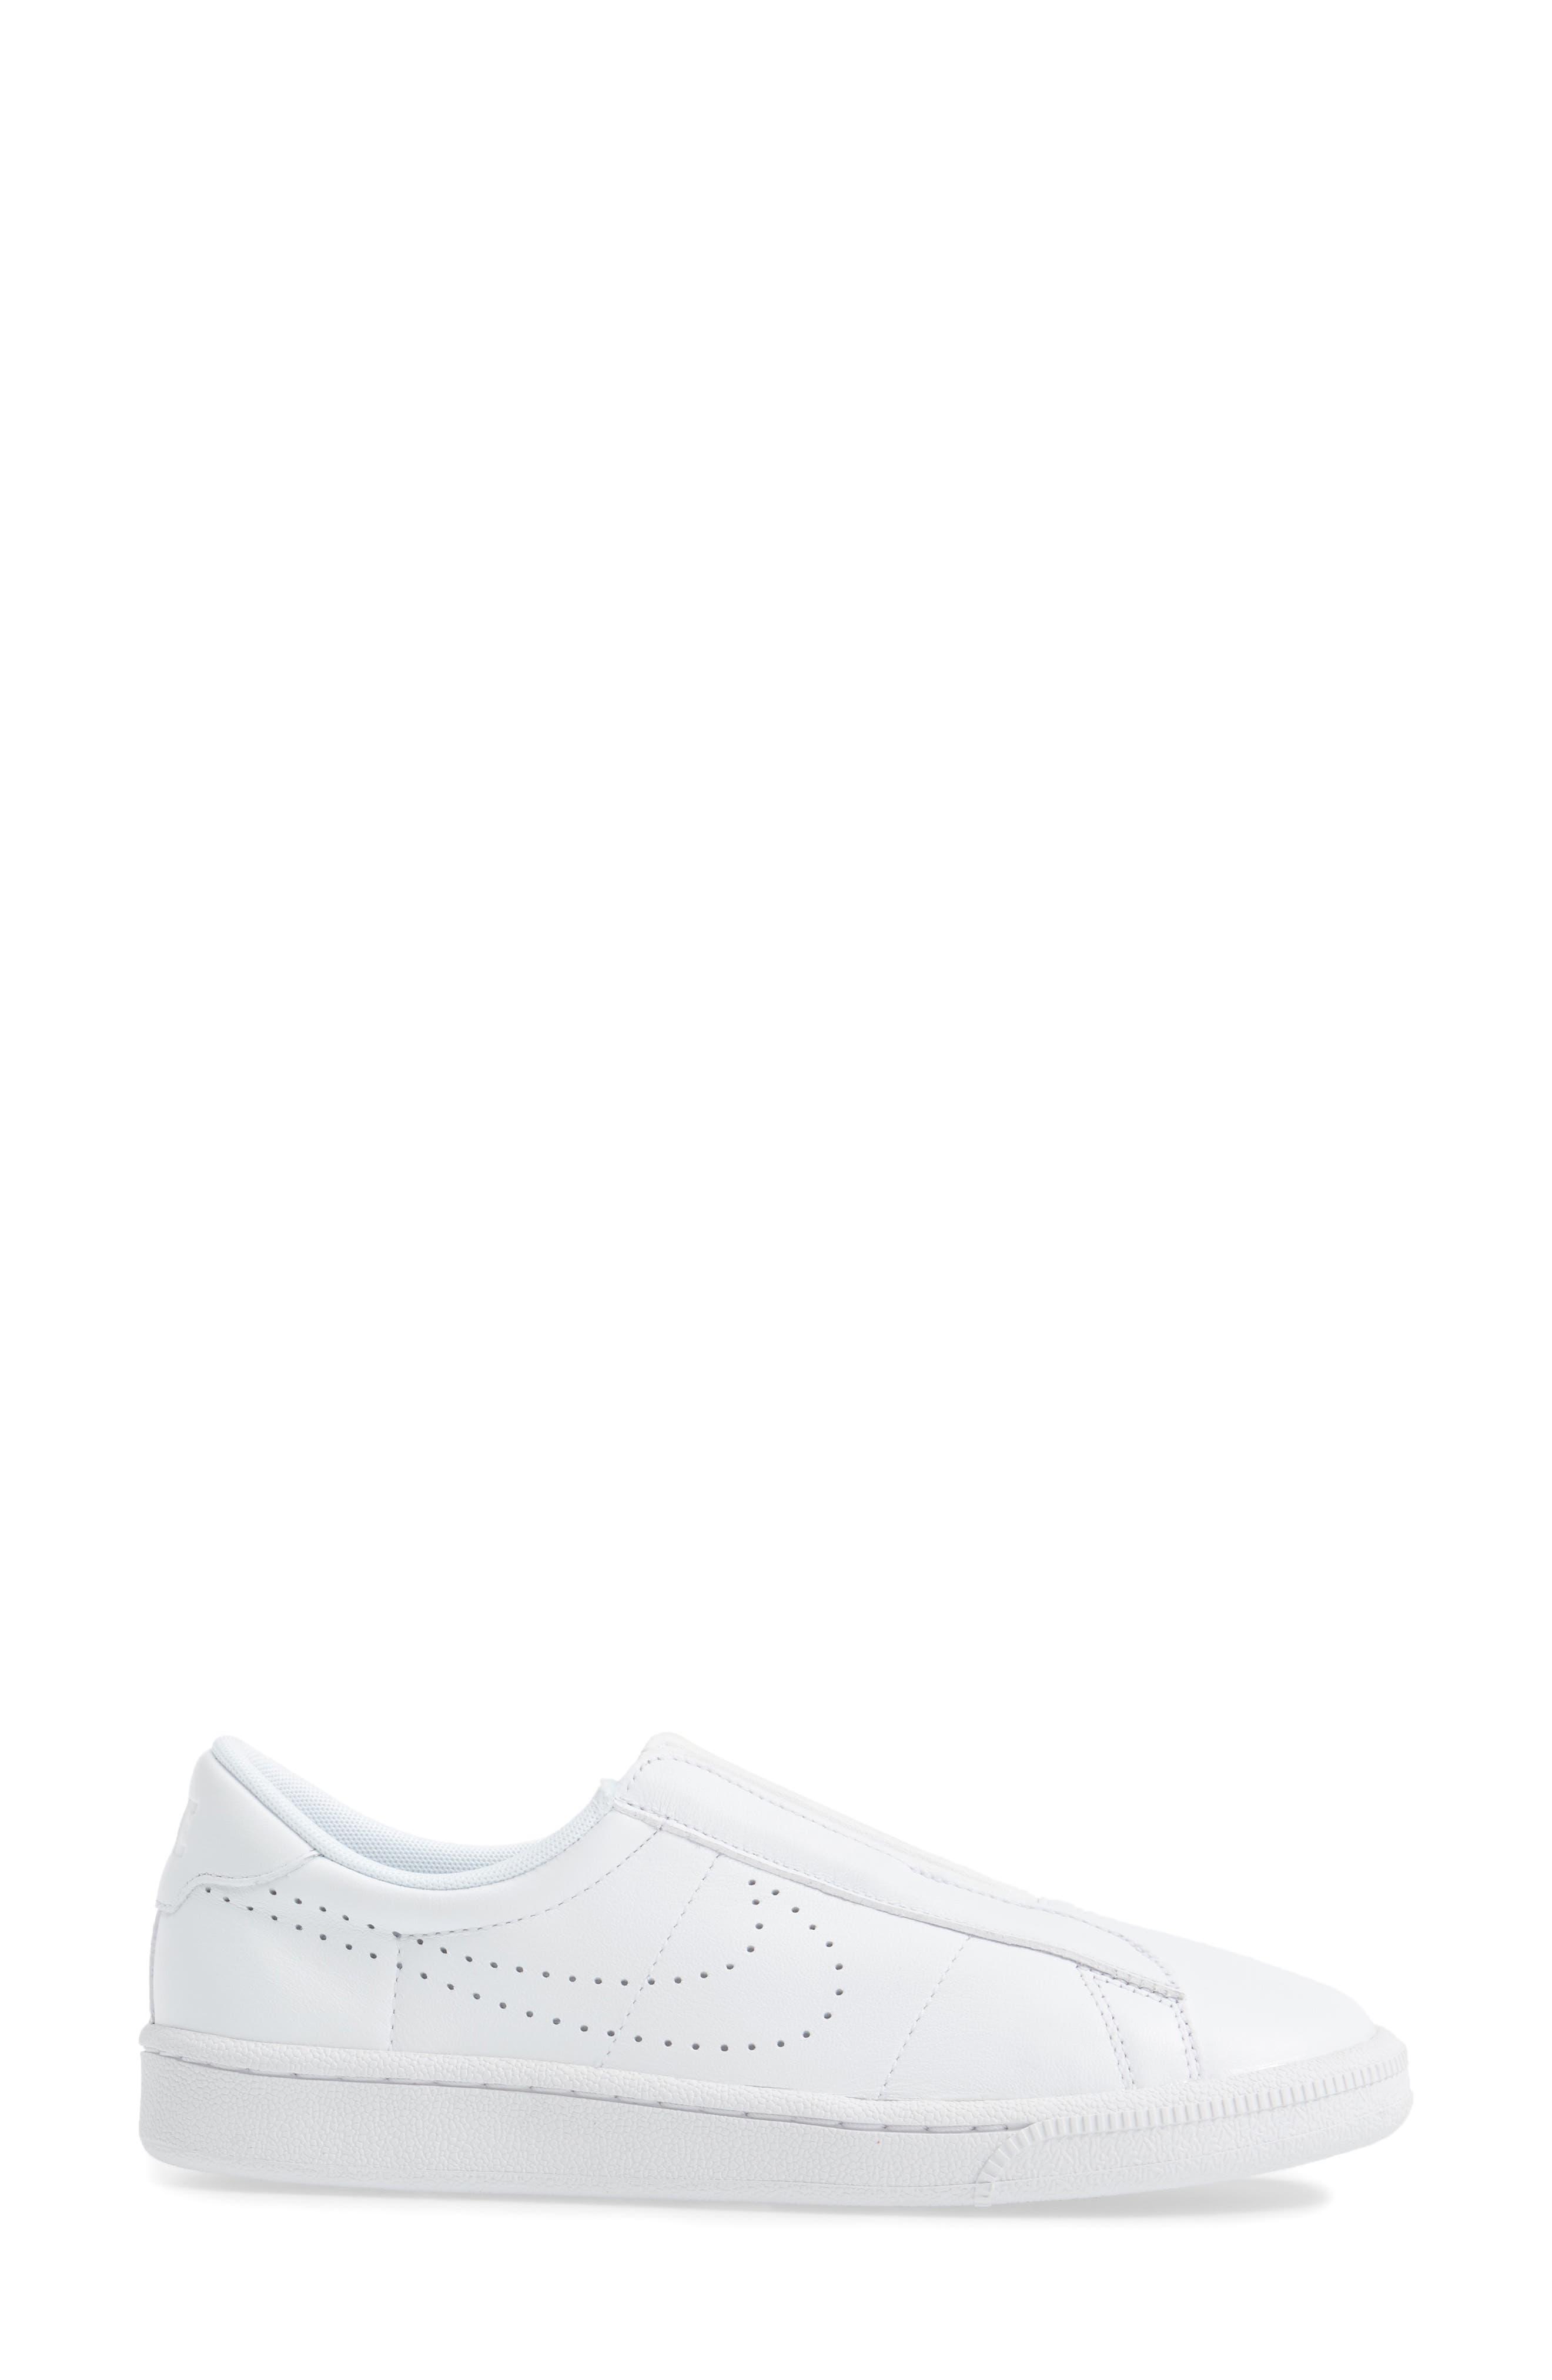 Classic EZ Slip-On Tennis Shoe,                             Alternate thumbnail 3, color,                             White/ White/ Black